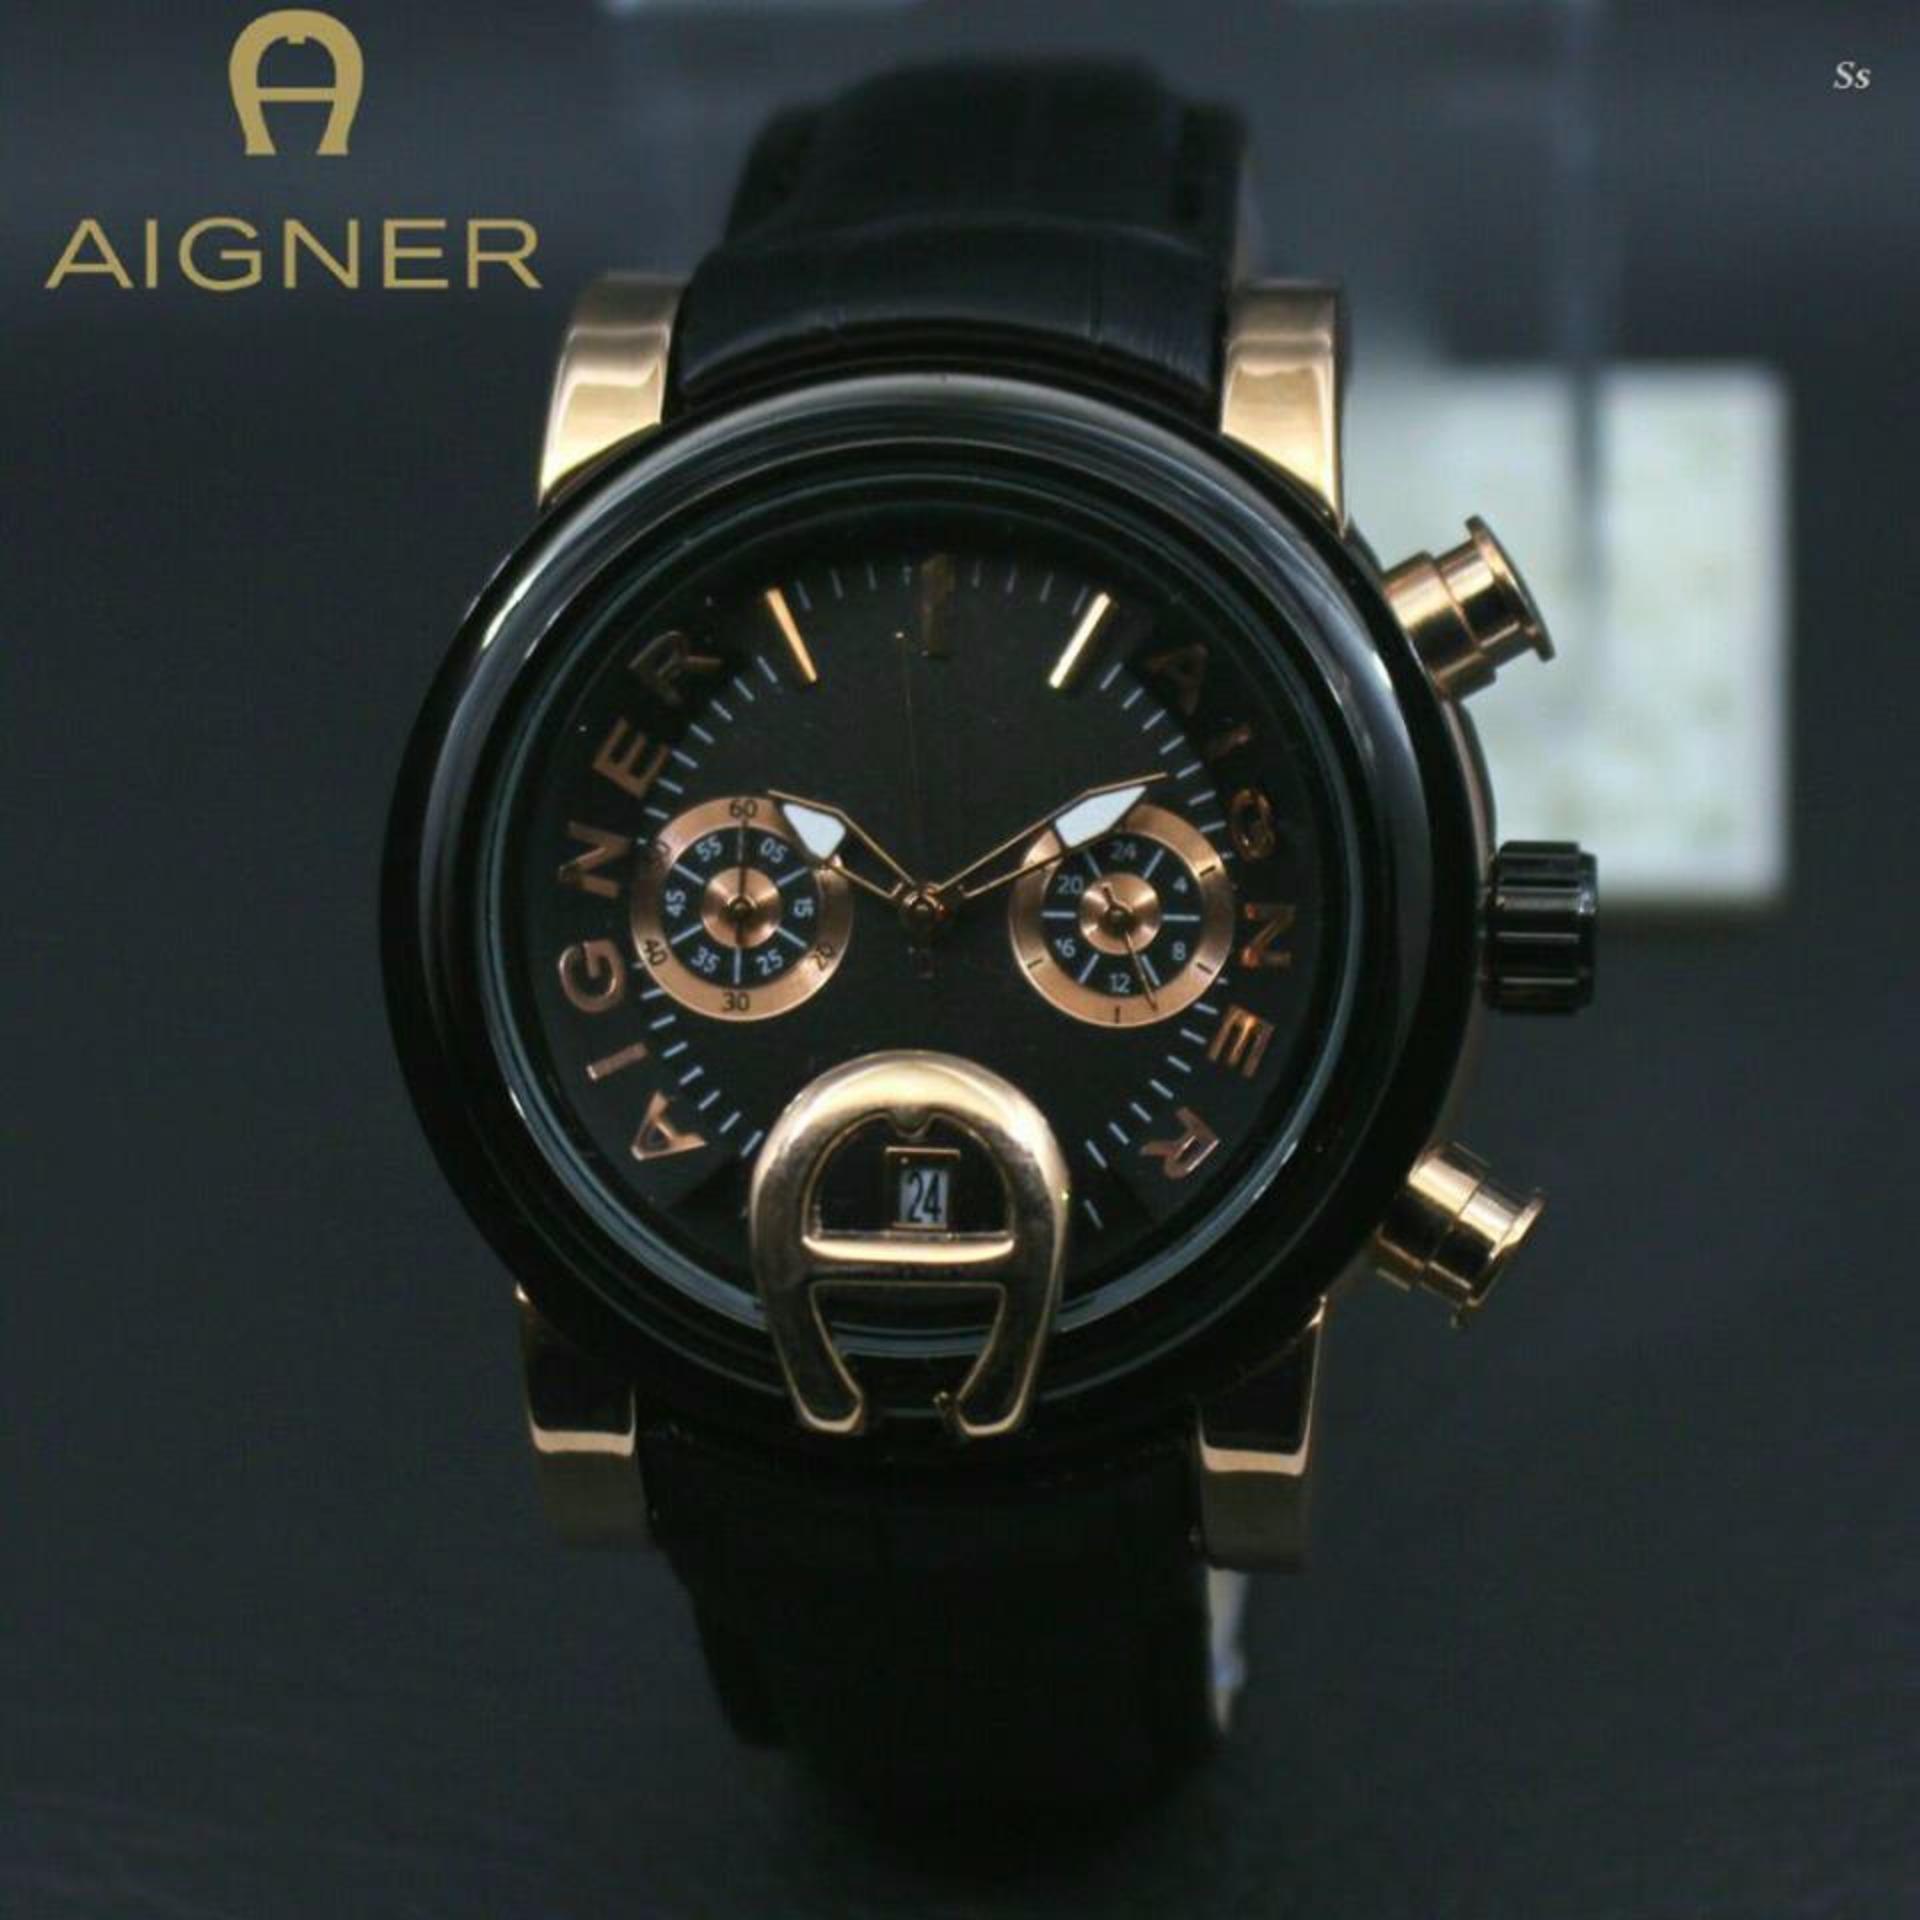 ... Jam Tangan Pria Casual Aigne'r - Chrono Aktif - Black leather strap ...